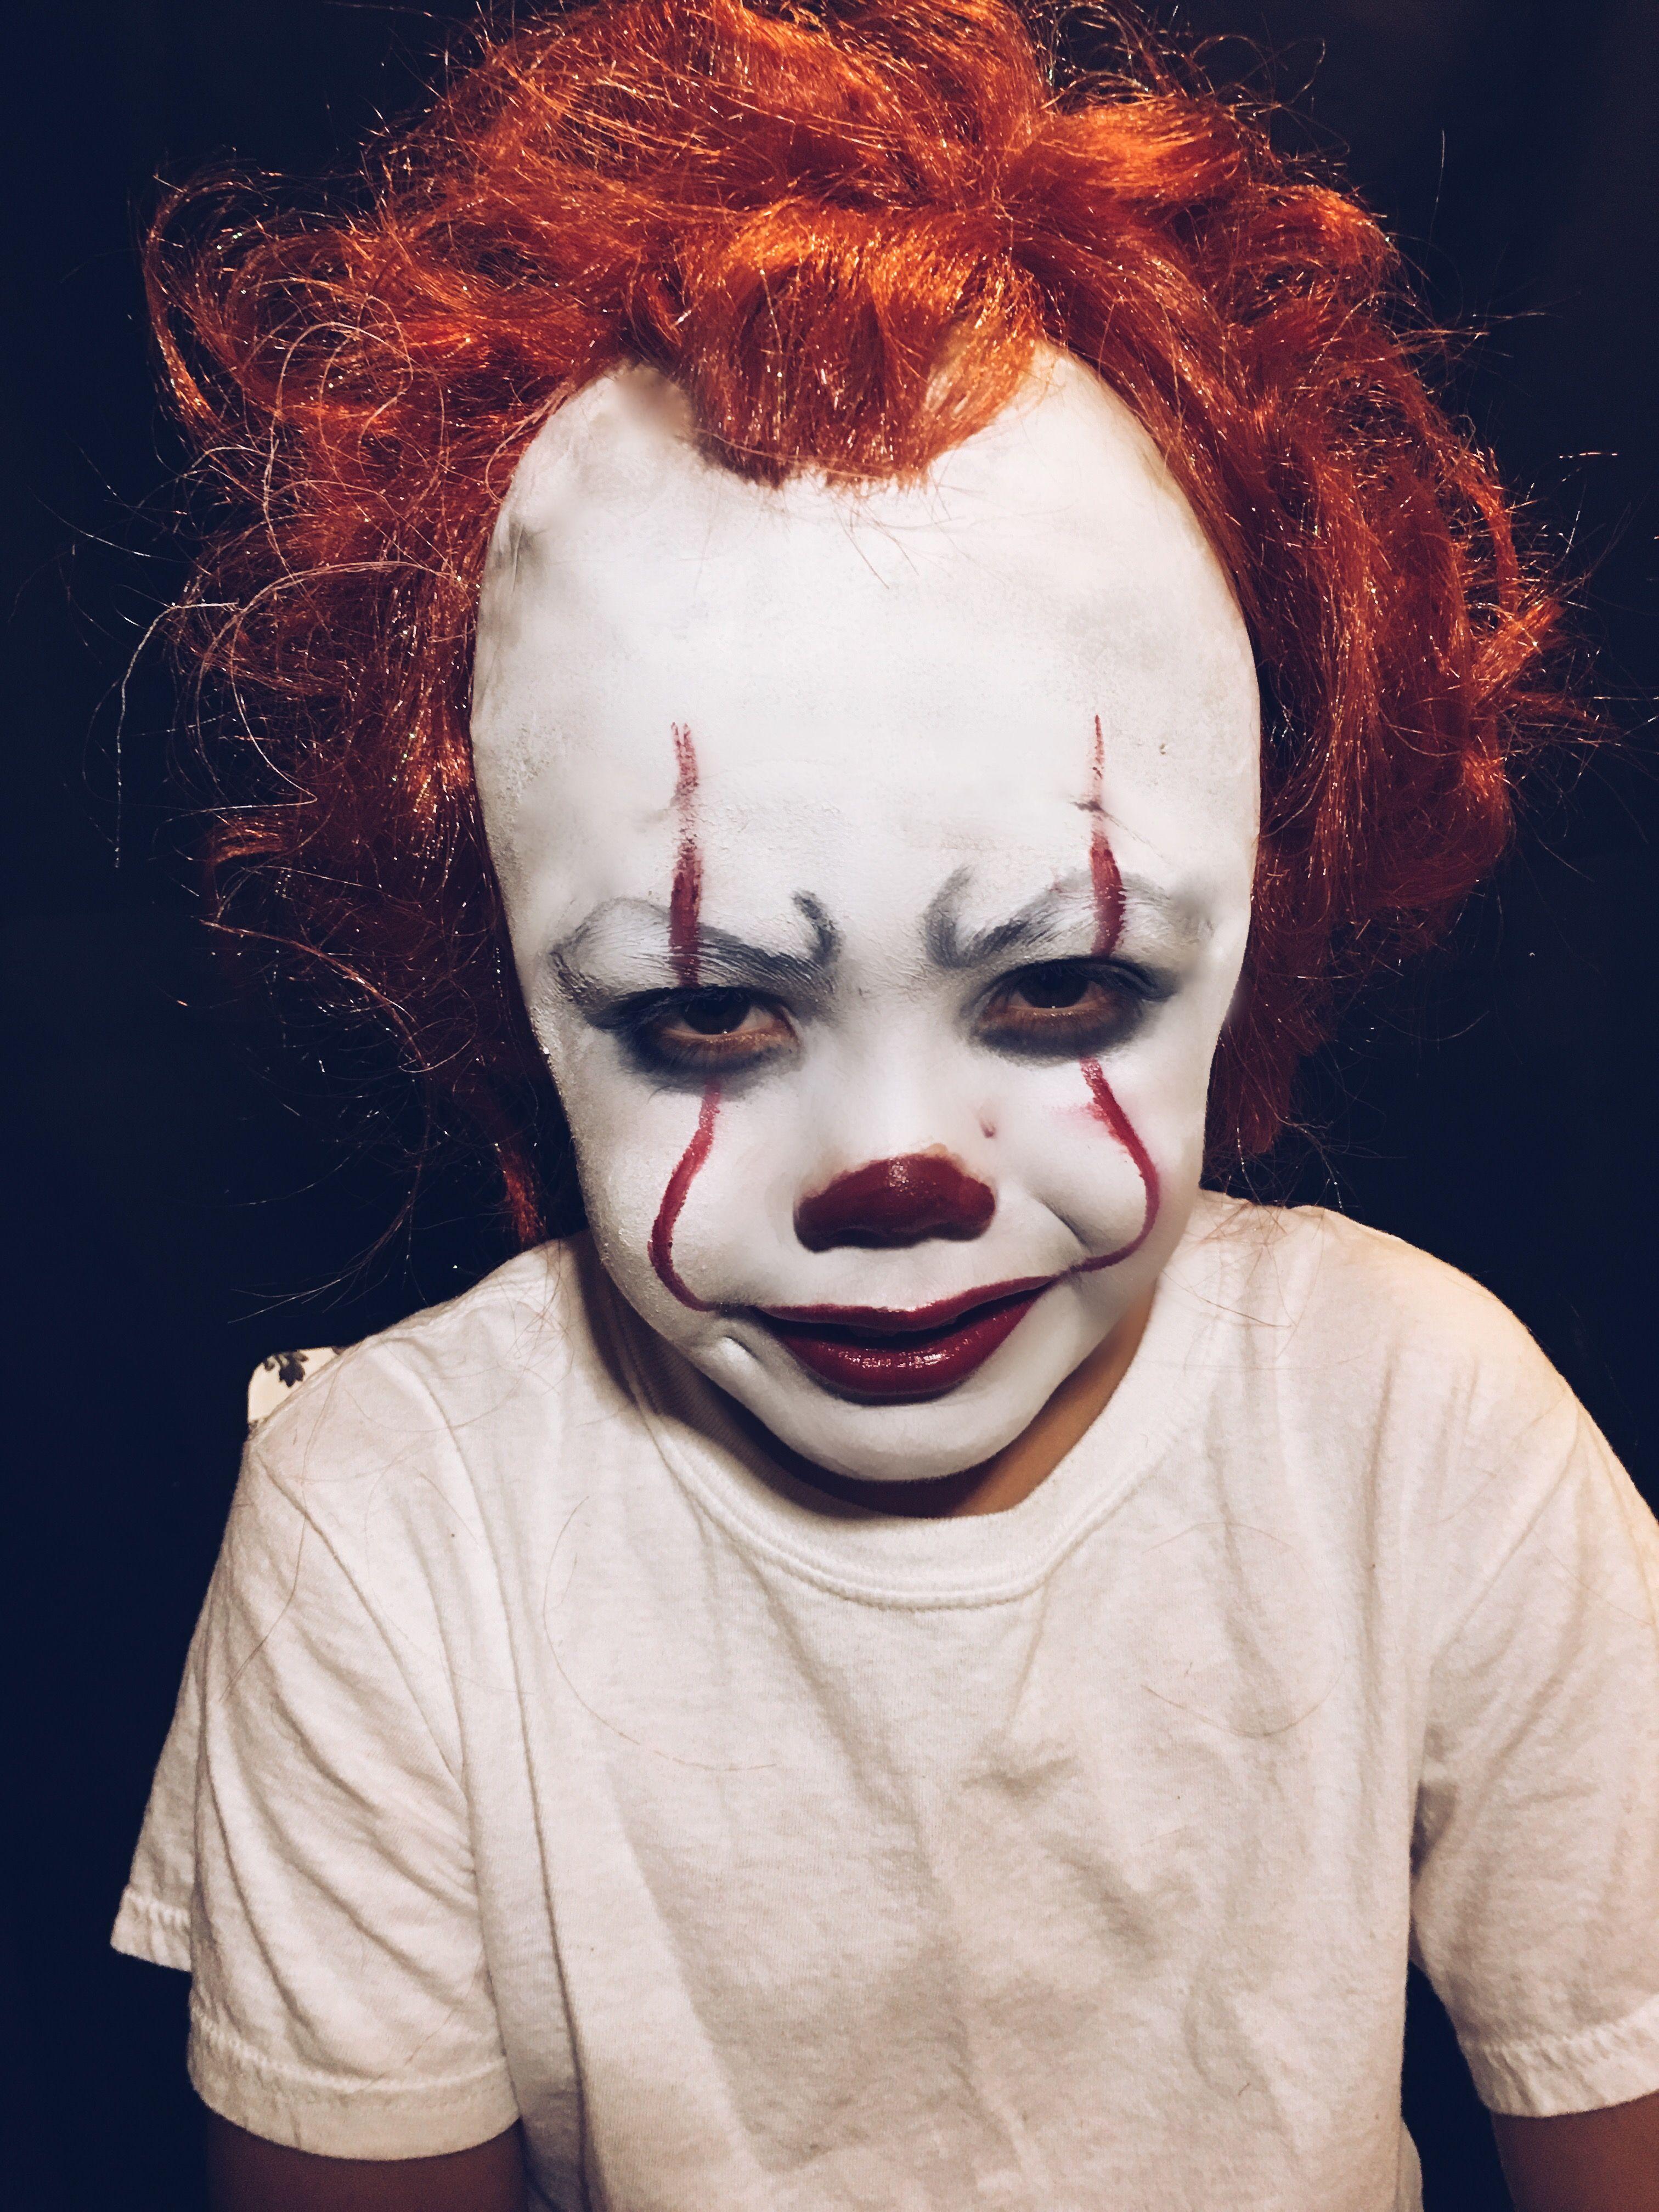 Pennywise The Clown Kids Halloween Makeup Scary Kids Halloween Costumes Clown Halloween Costumes Cool Halloween Makeup